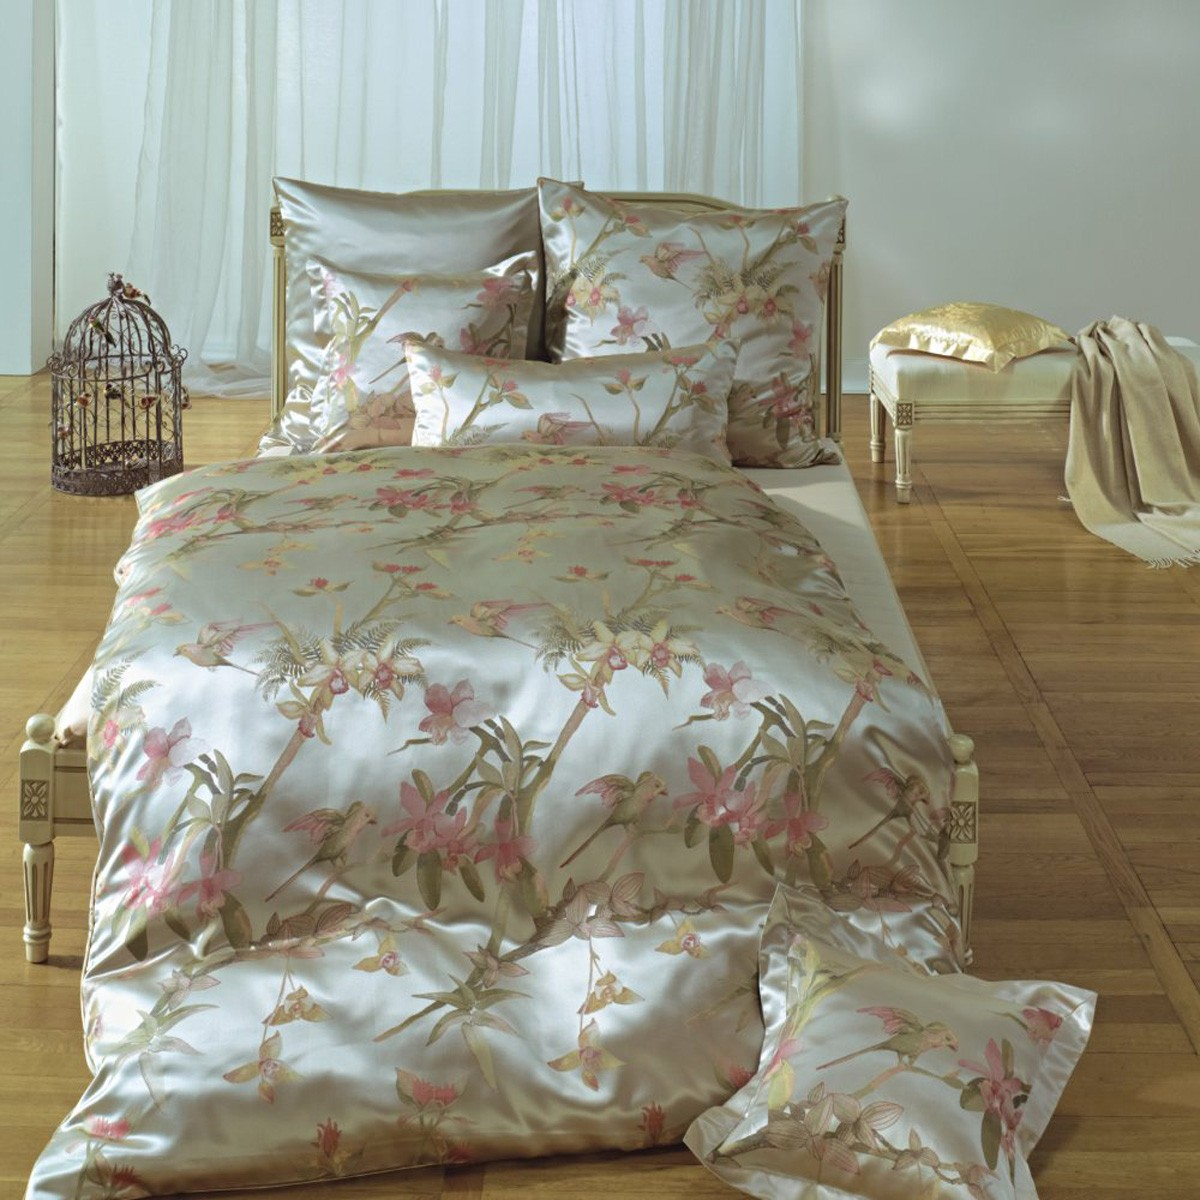 bettw sche curt bauer el dorado exotic. Black Bedroom Furniture Sets. Home Design Ideas